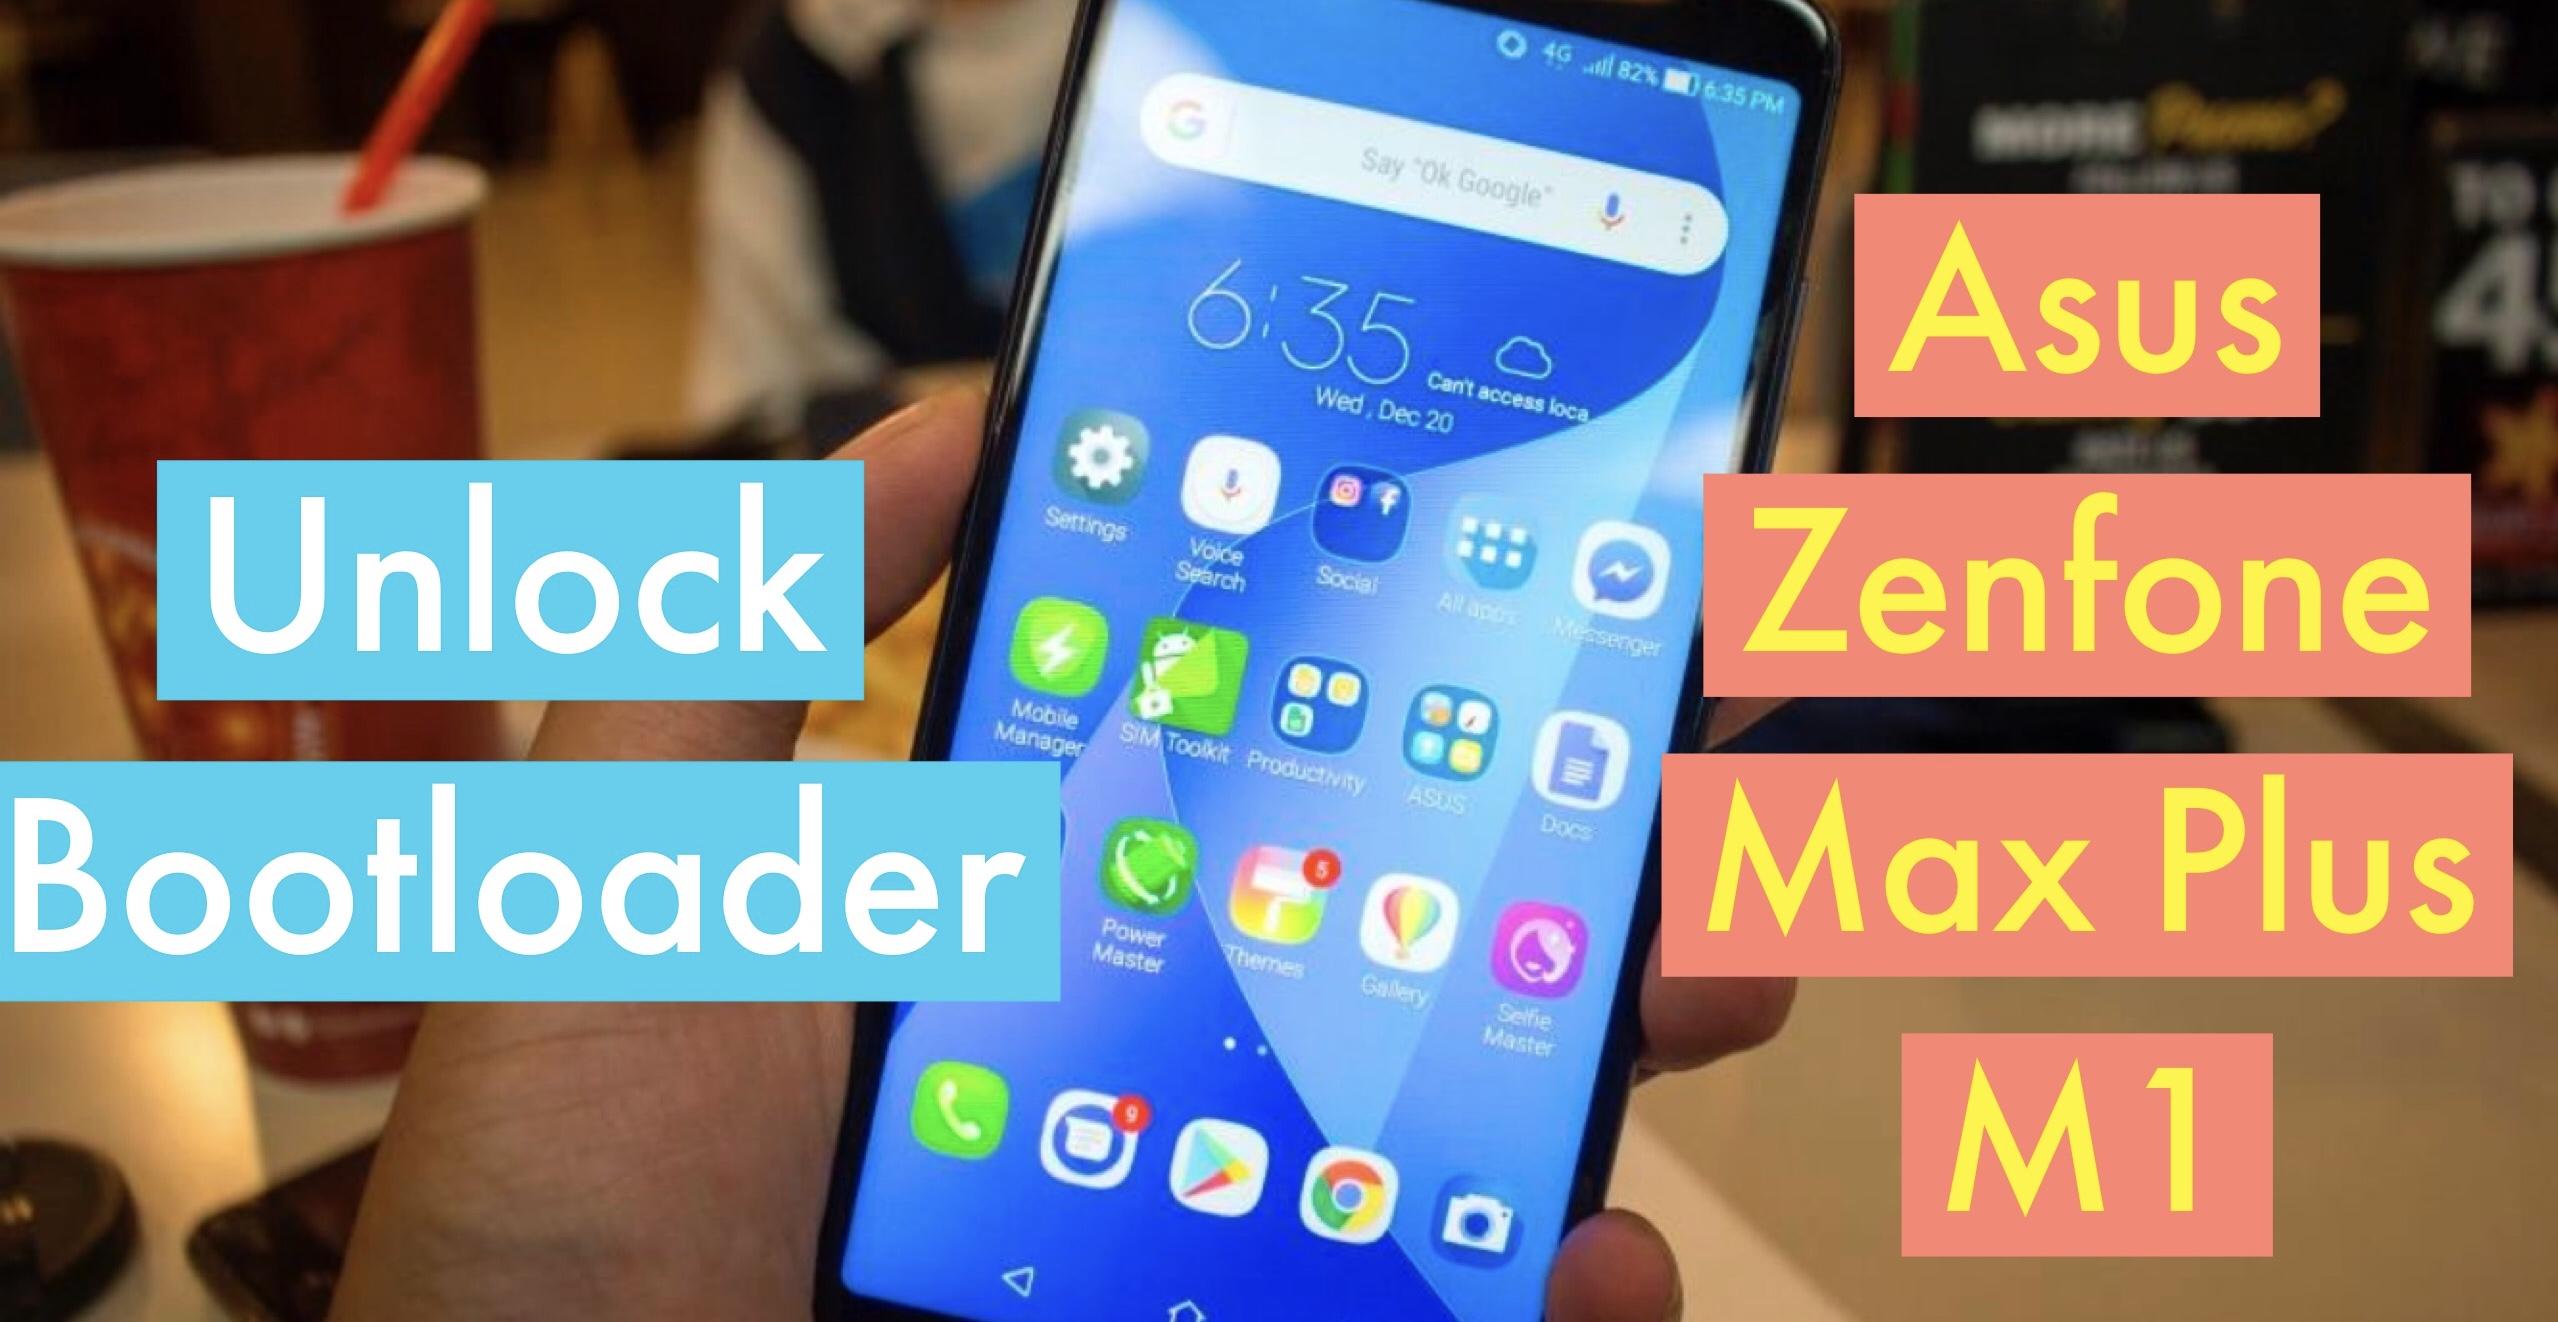 How to Unlock Bootloader on ASUS Zenfone Max Plus M1- UNLOCK